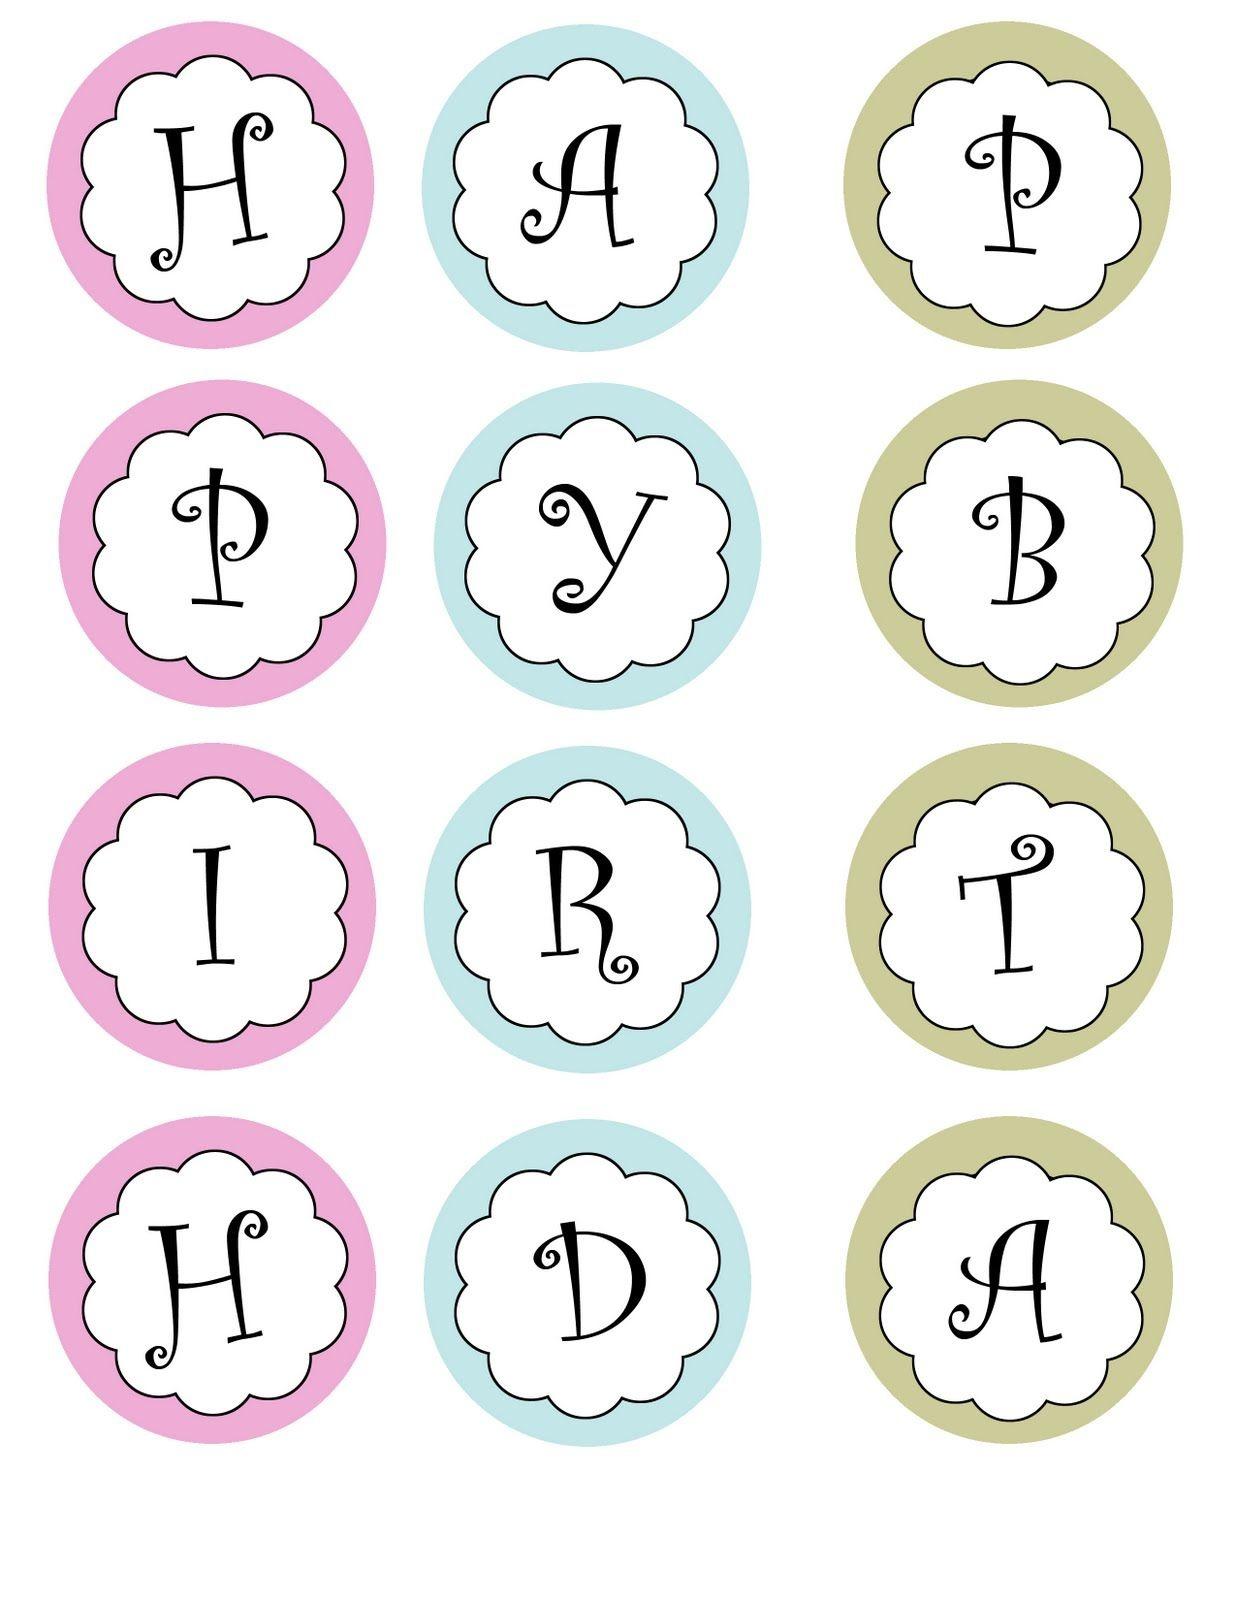 Printable Banners Templates Free | Print Your Own Birthday Banner - Free Happy Birthday Printable Letters